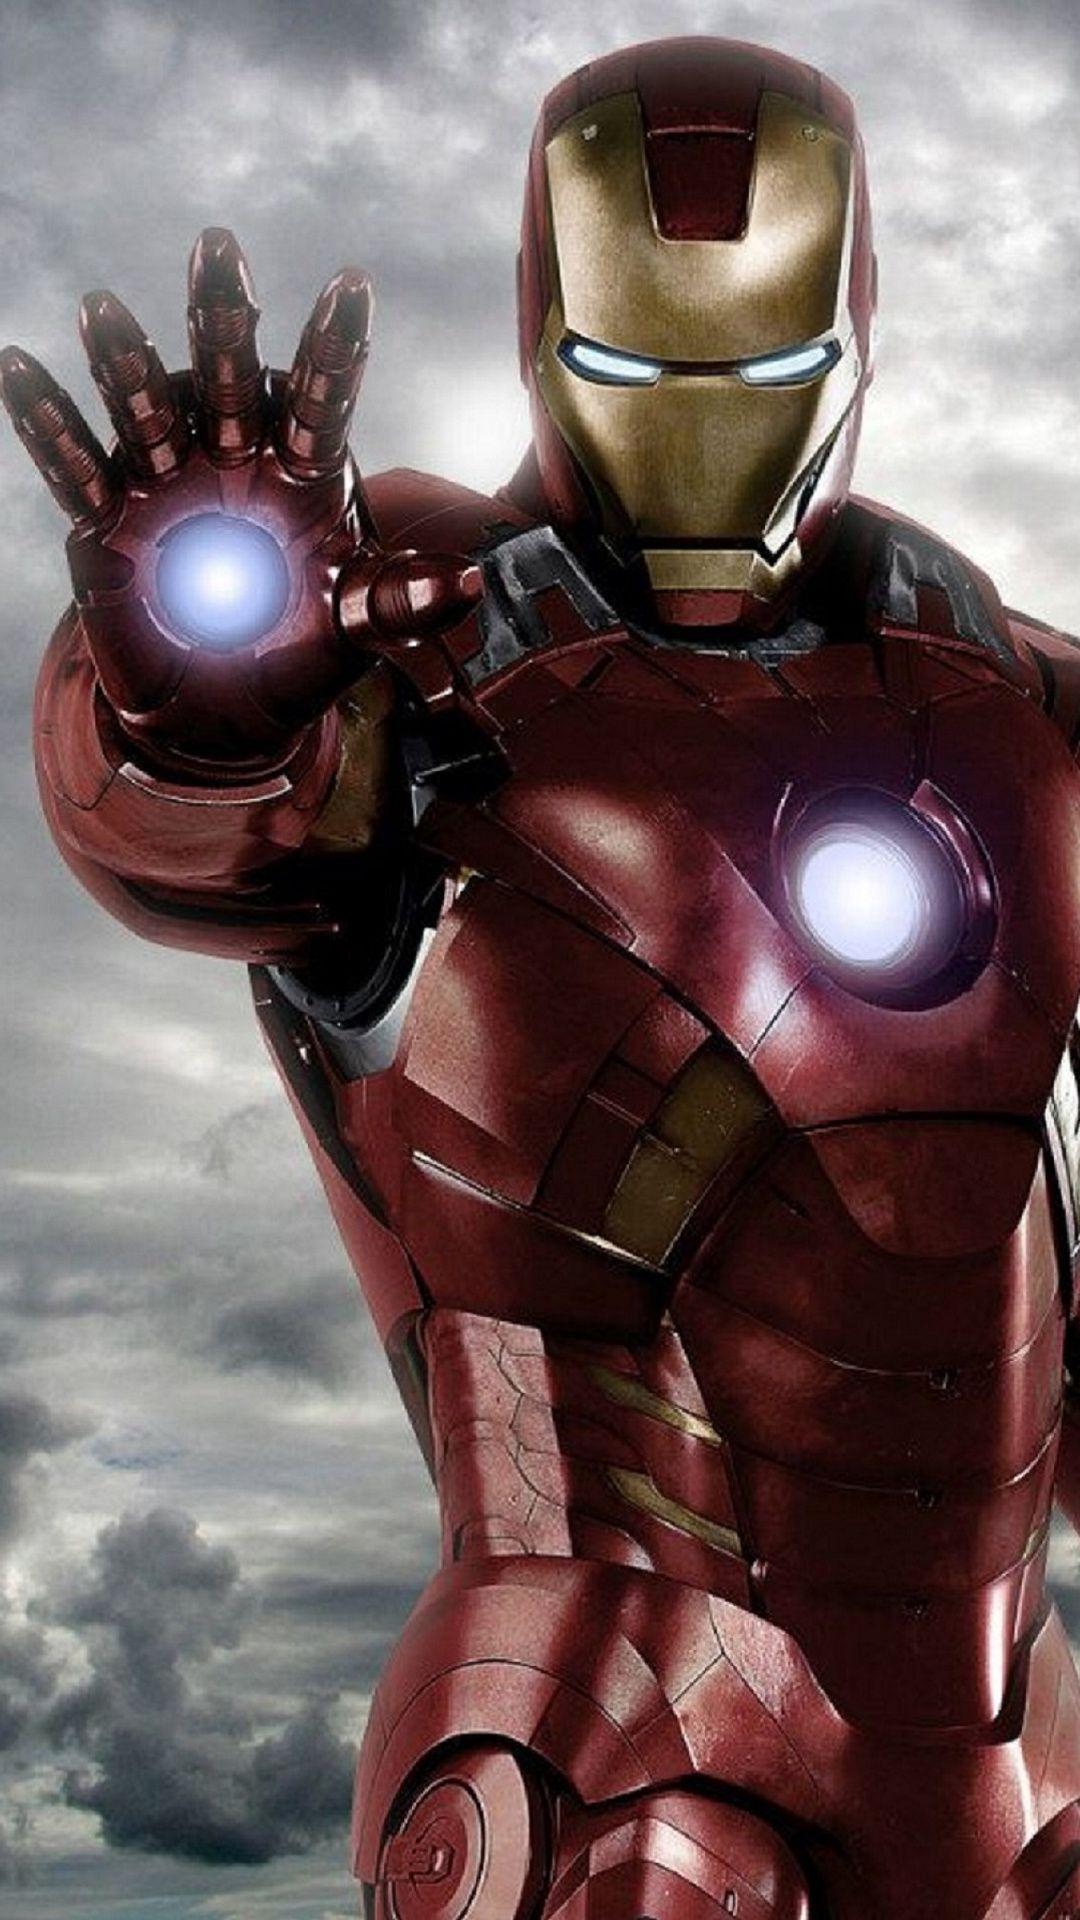 Iron Man Mobile Hd Wallpaper Iron Man Hd Wallpaper Iron Man Wallpaper Iron Man Cartoon